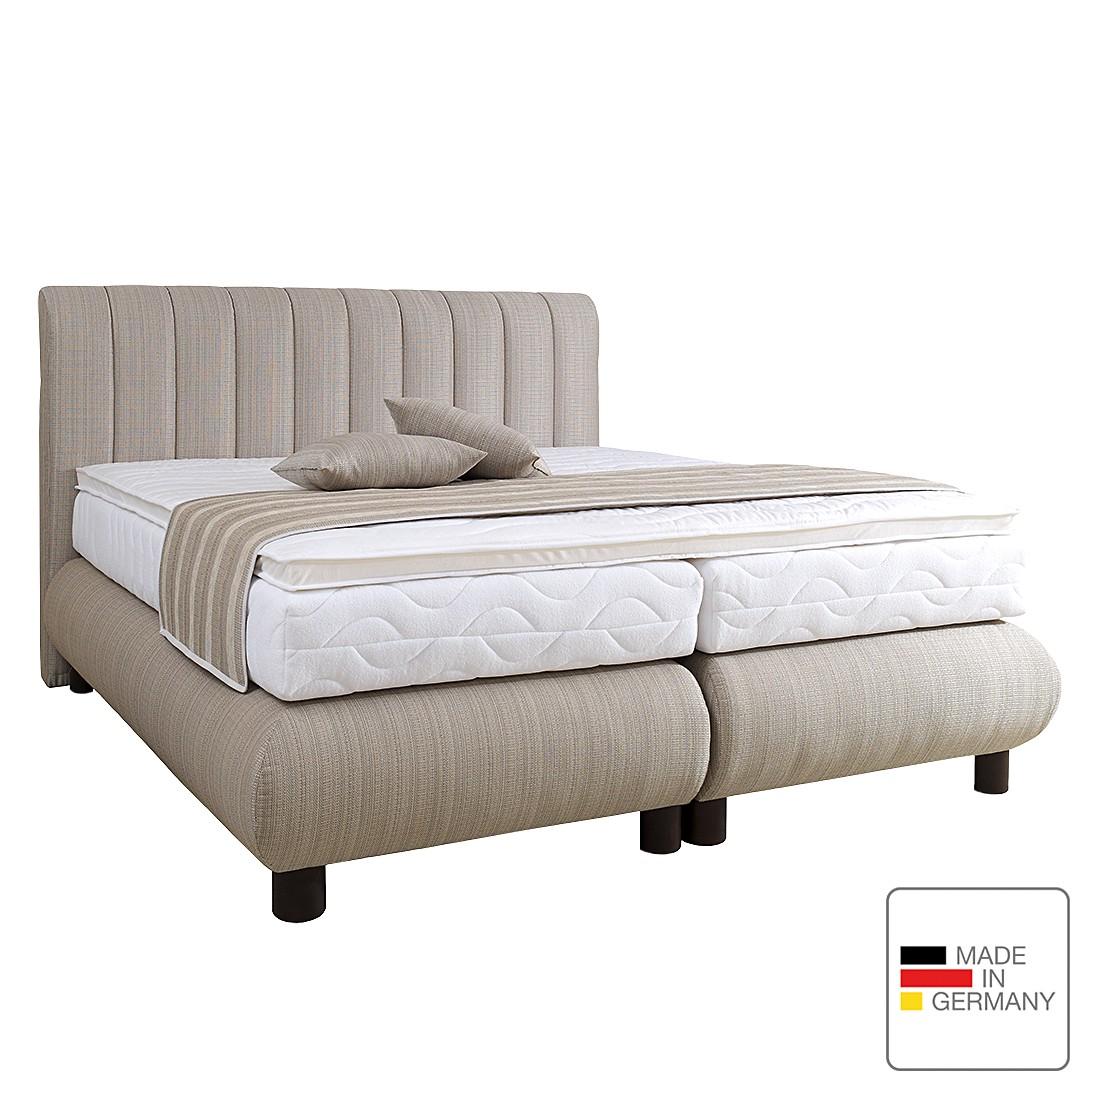 boxspringbett romeo strukturstoff 160 x 200cm h2 bis 80 kg visco kaltschaummatratze. Black Bedroom Furniture Sets. Home Design Ideas